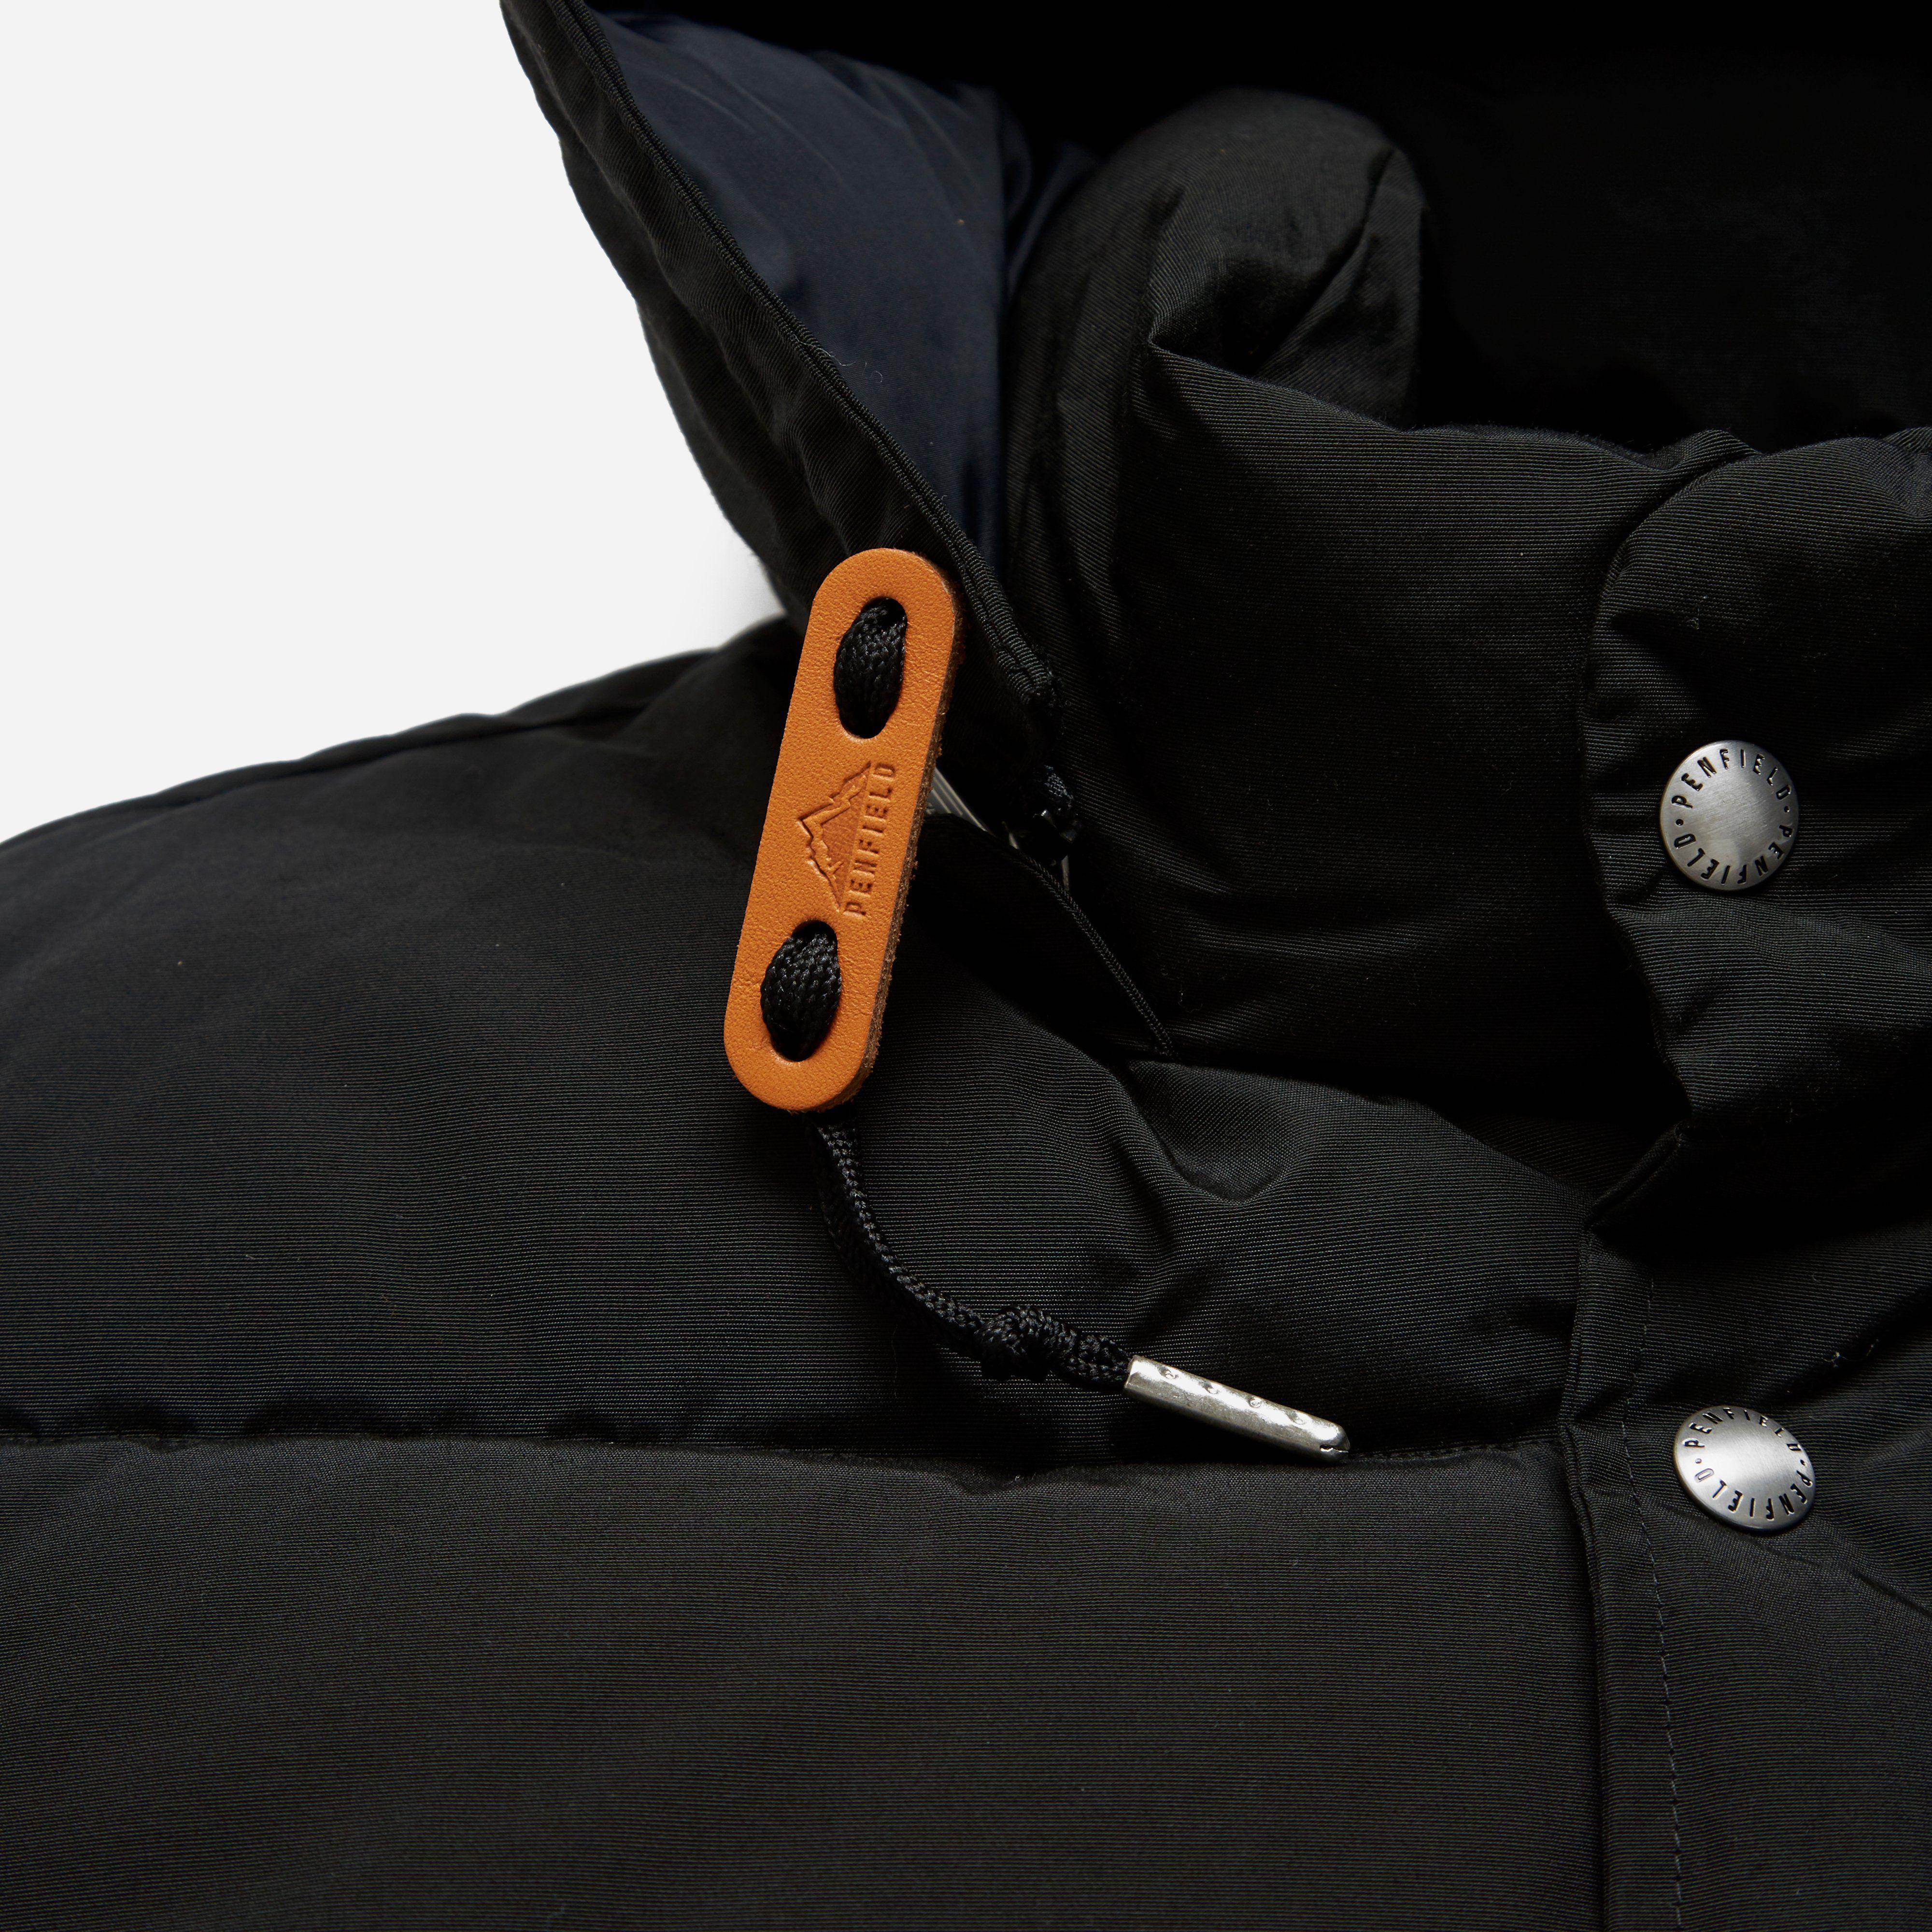 Penfield Bowerbridge Jacket